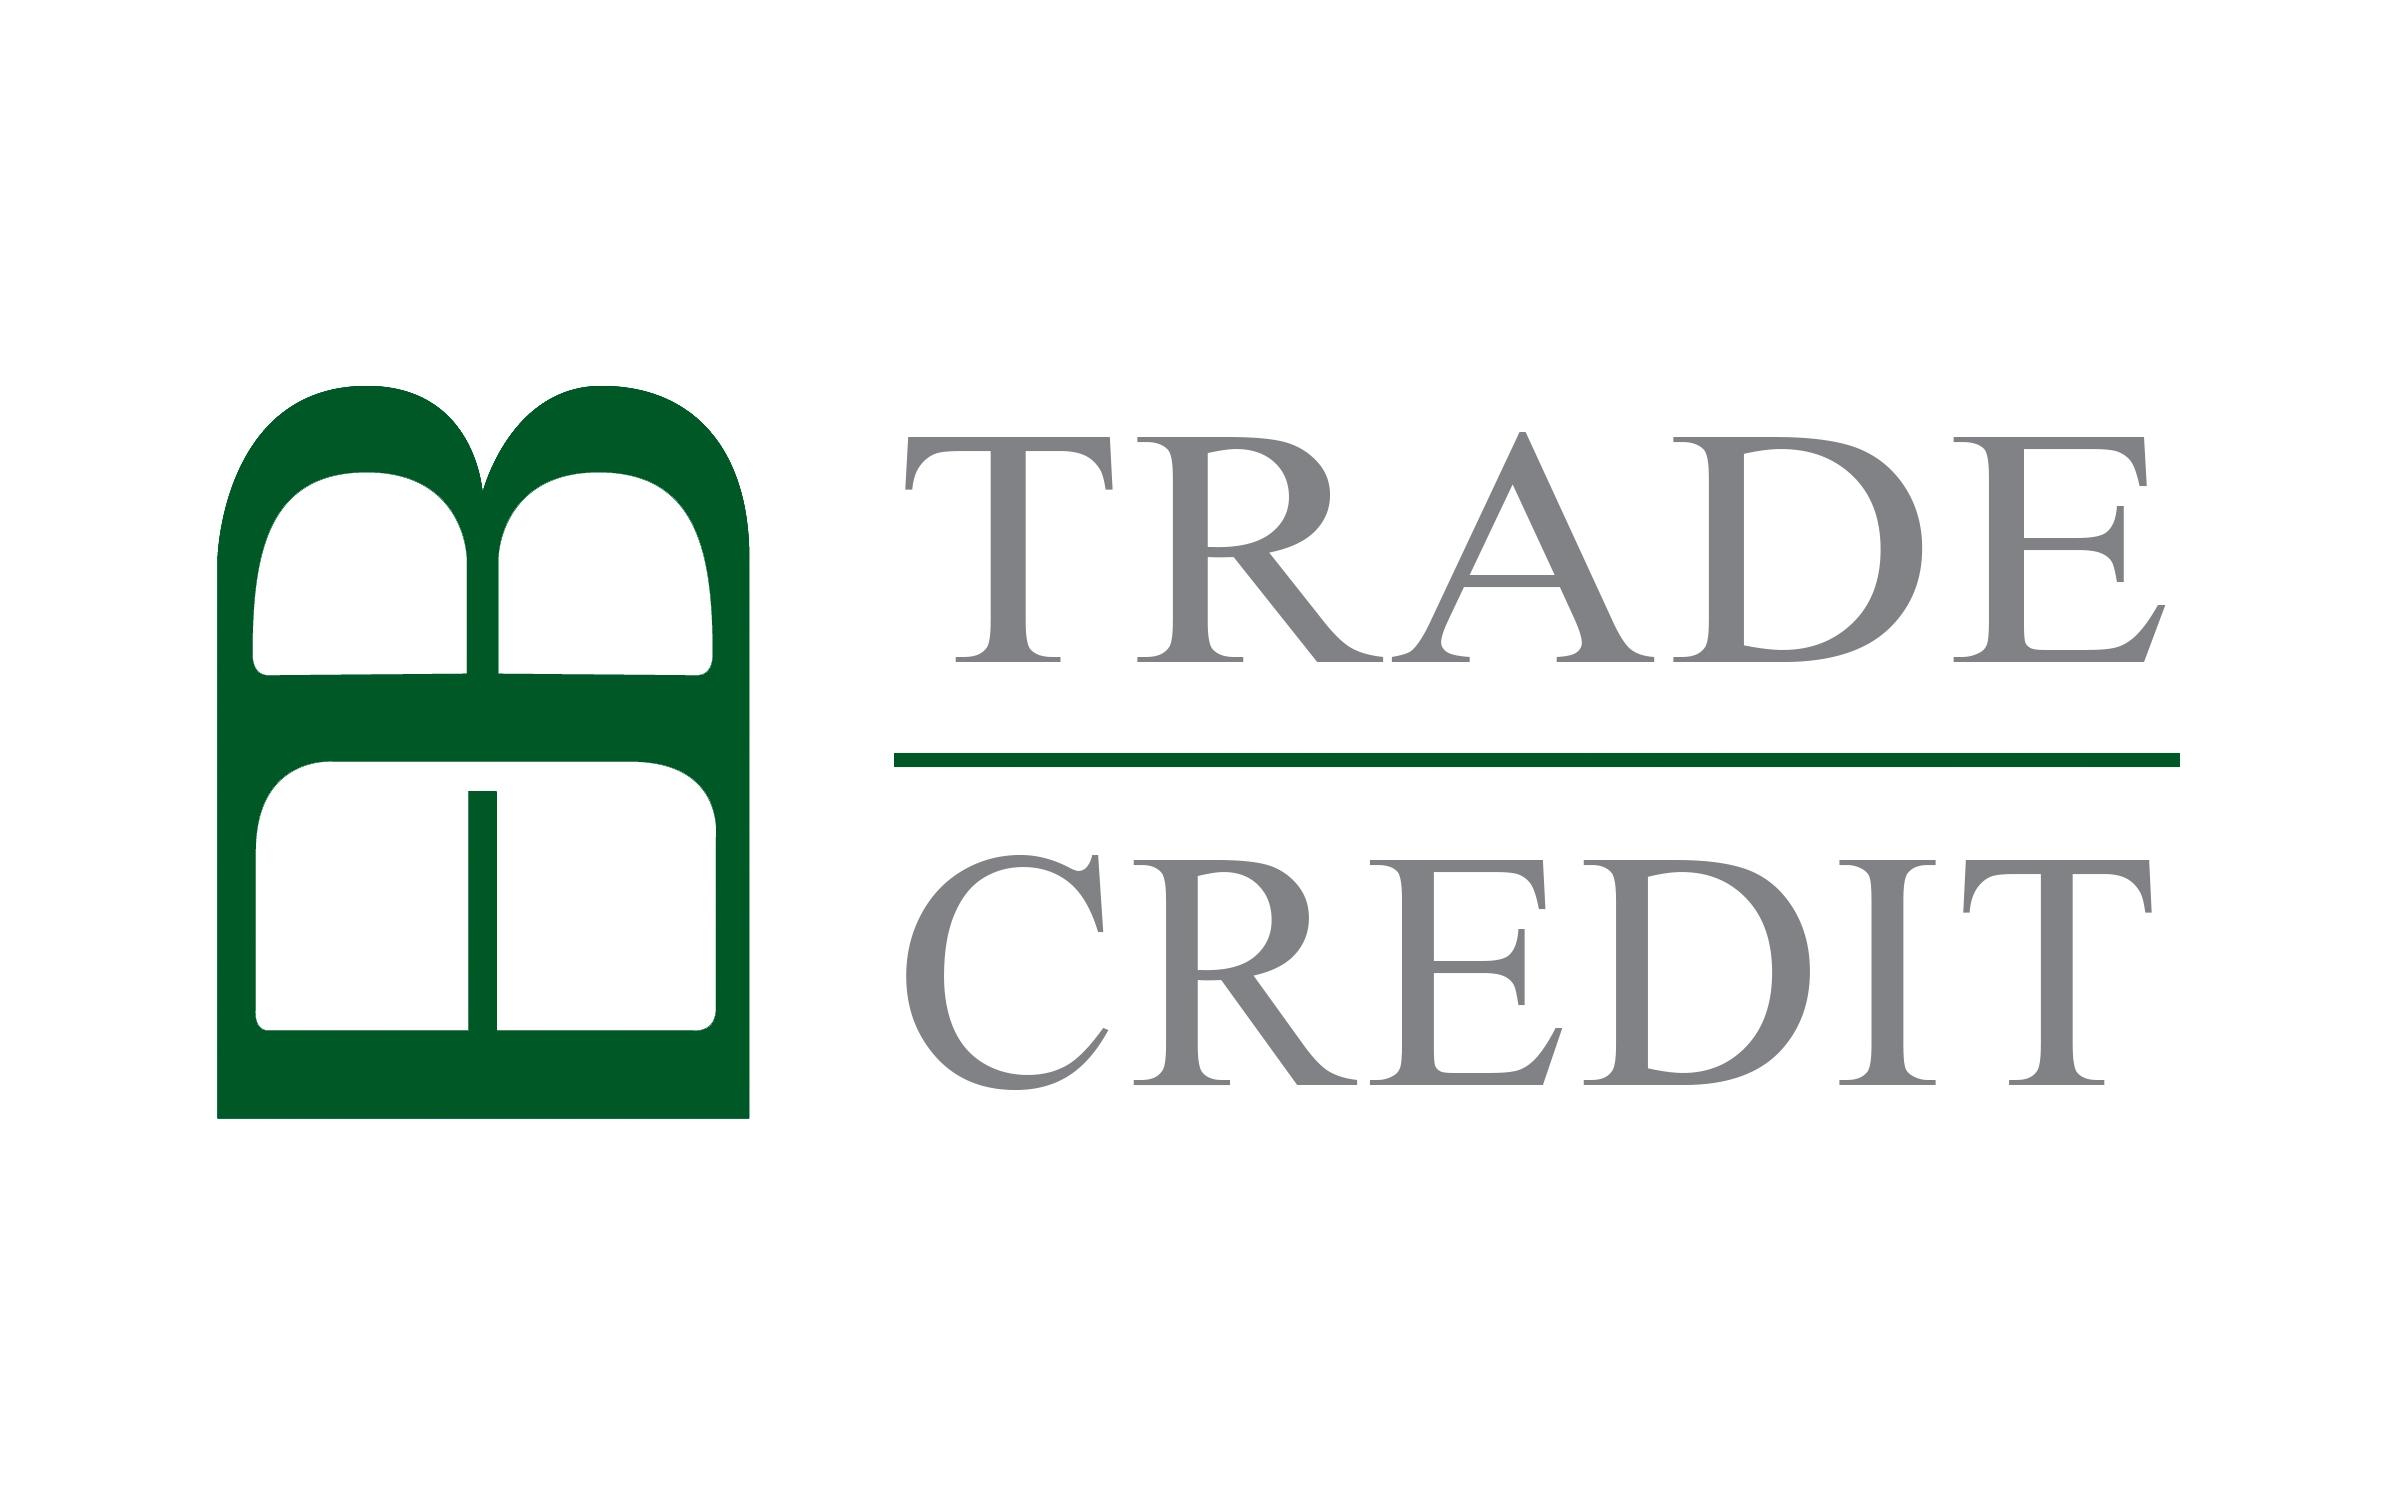 EB Trade Credit